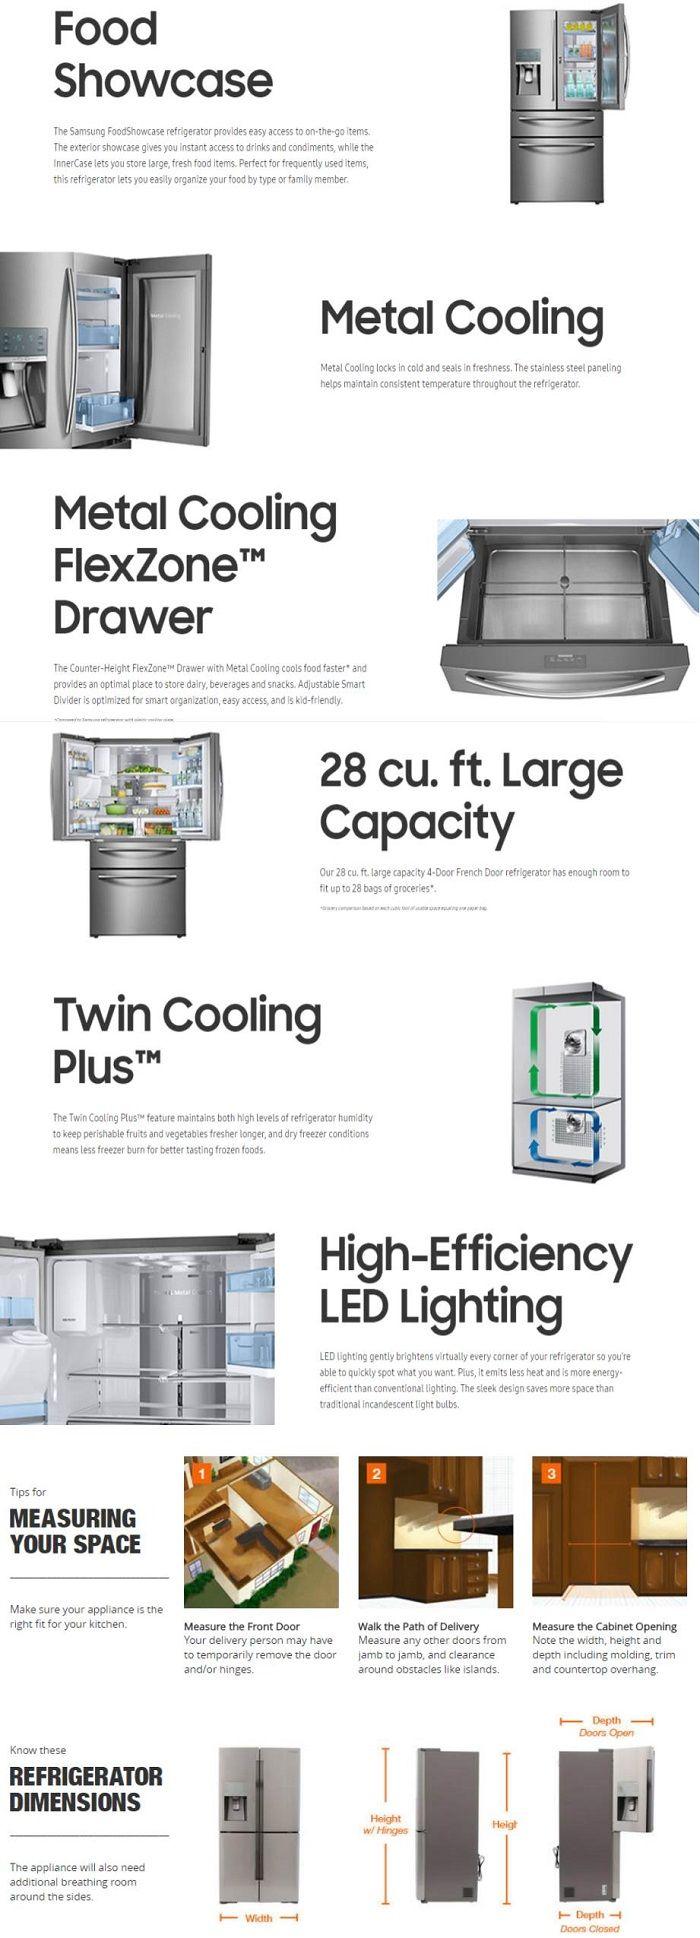 Samsung 27.8 cu. ft. Food Showcase 4-Door French Door Refrigerator in Stainless Steel-RF28JBEDBSR - The Home Depot